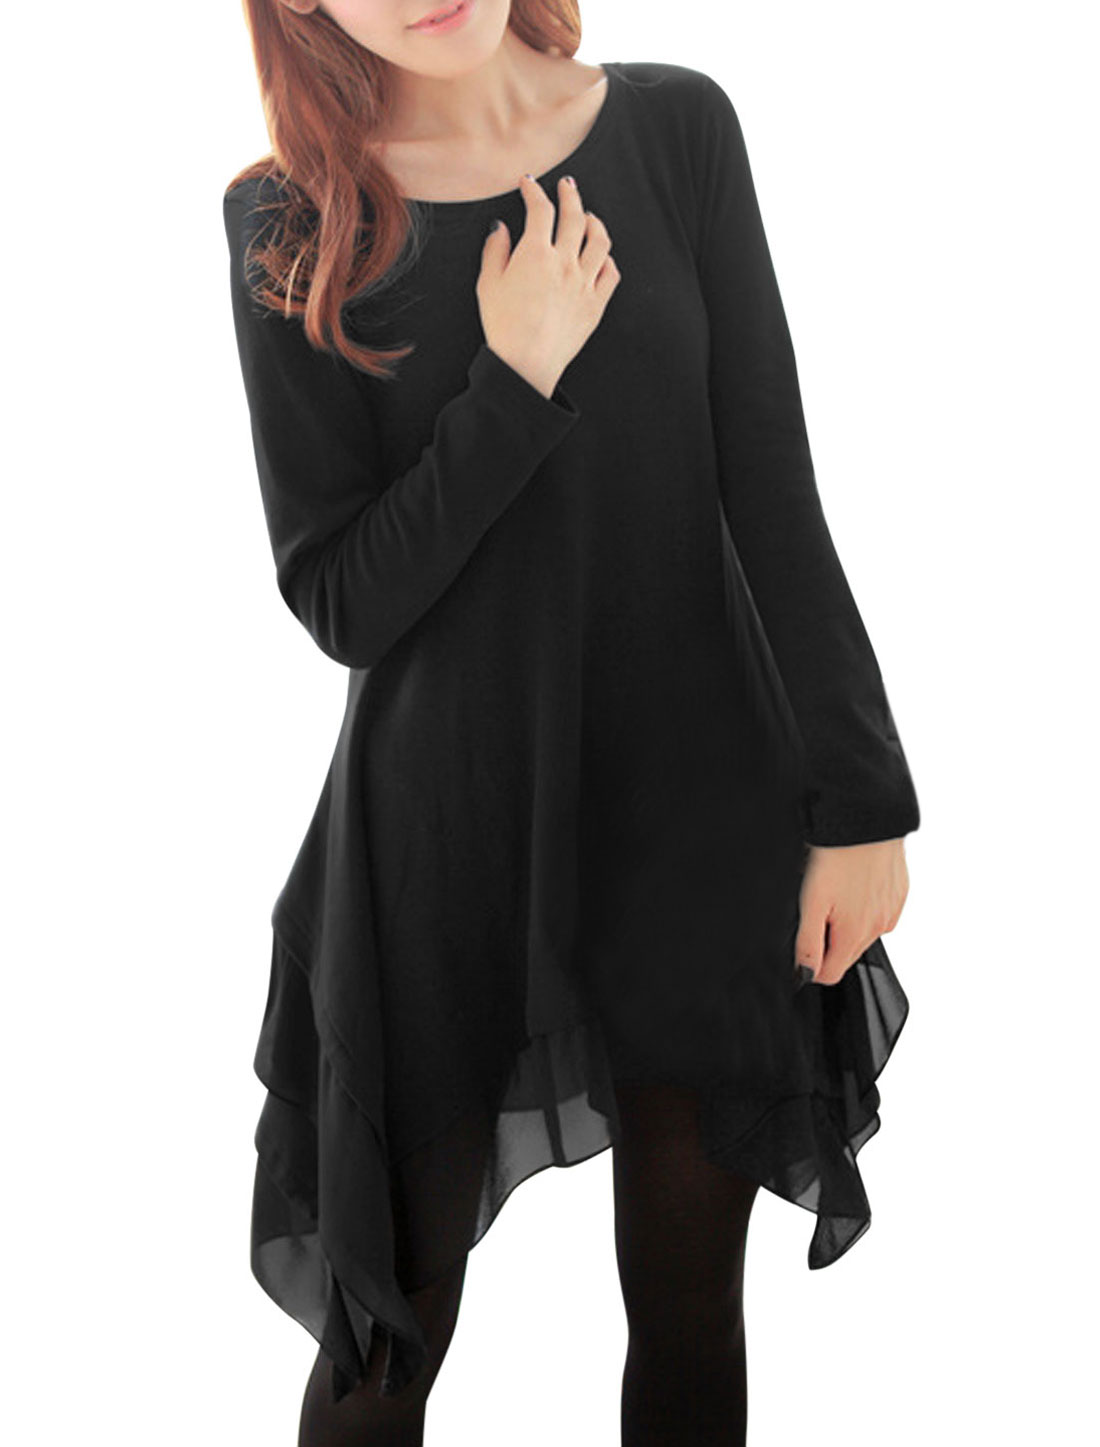 Ladies Black Long Sleeves Round Neck Asymmetrical Hem Splice Casual Dress S